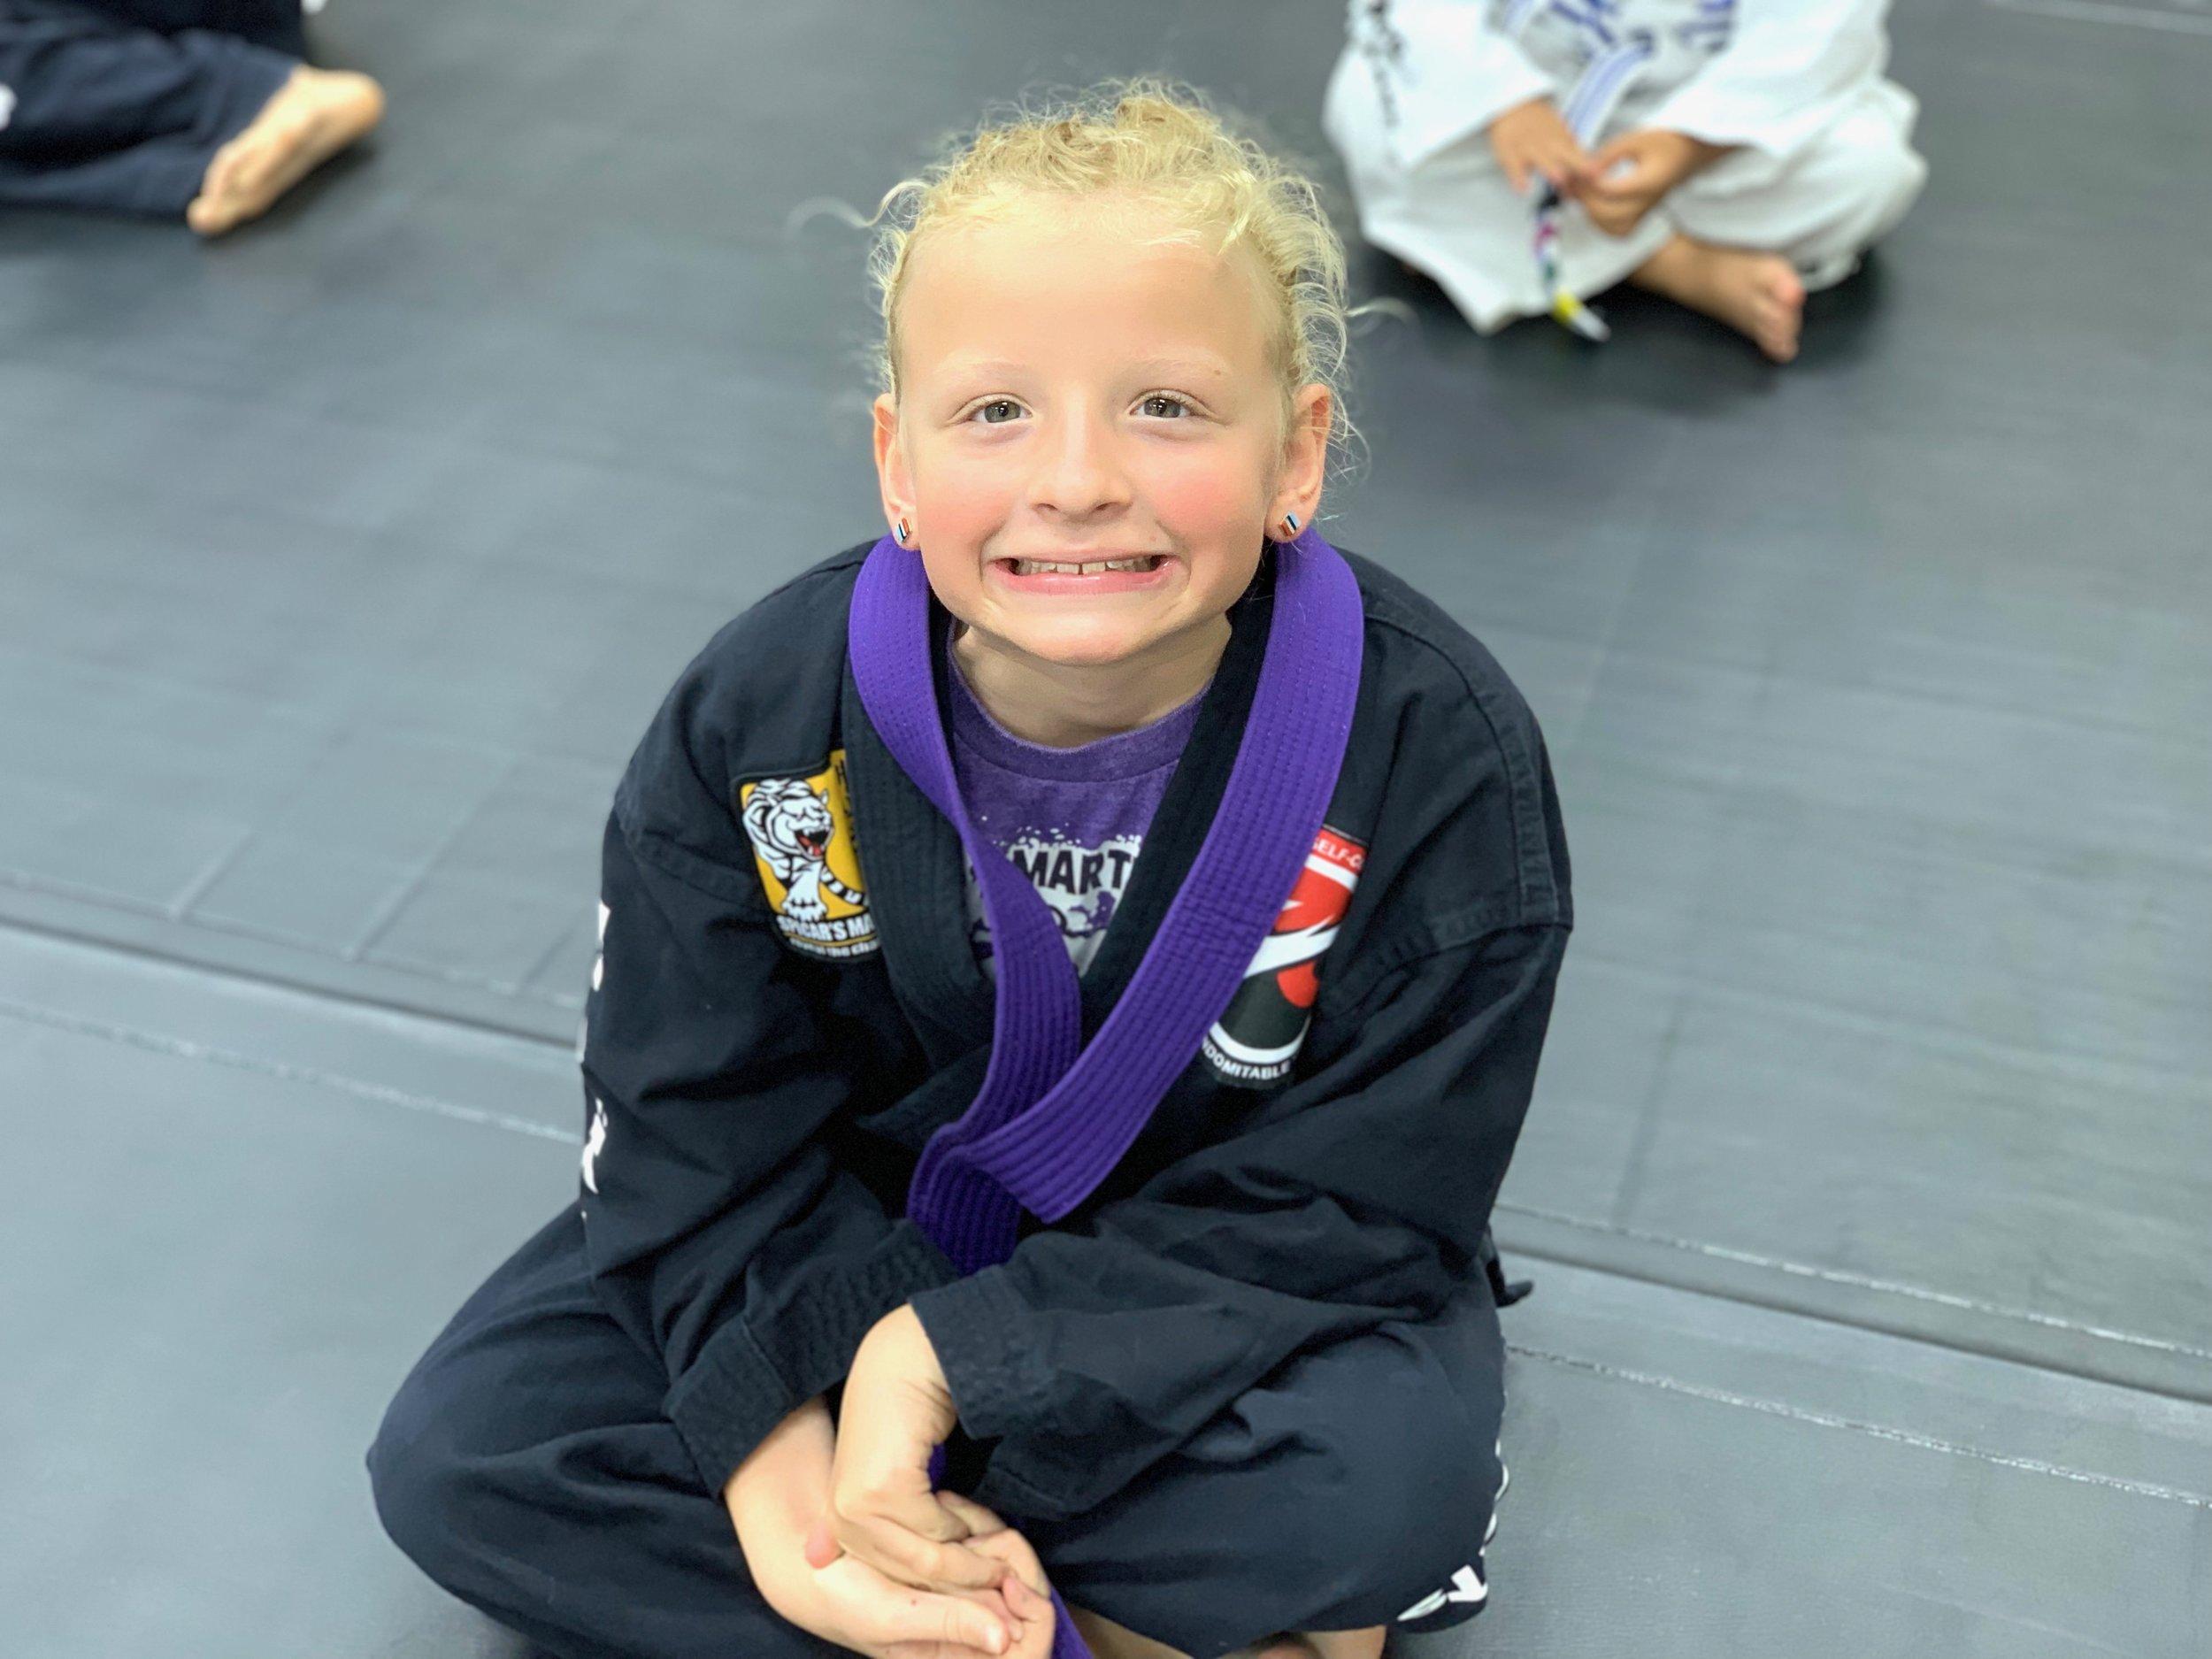 karate-kids-program-souhtlake-keller-grapevine-texas00016.jpeg